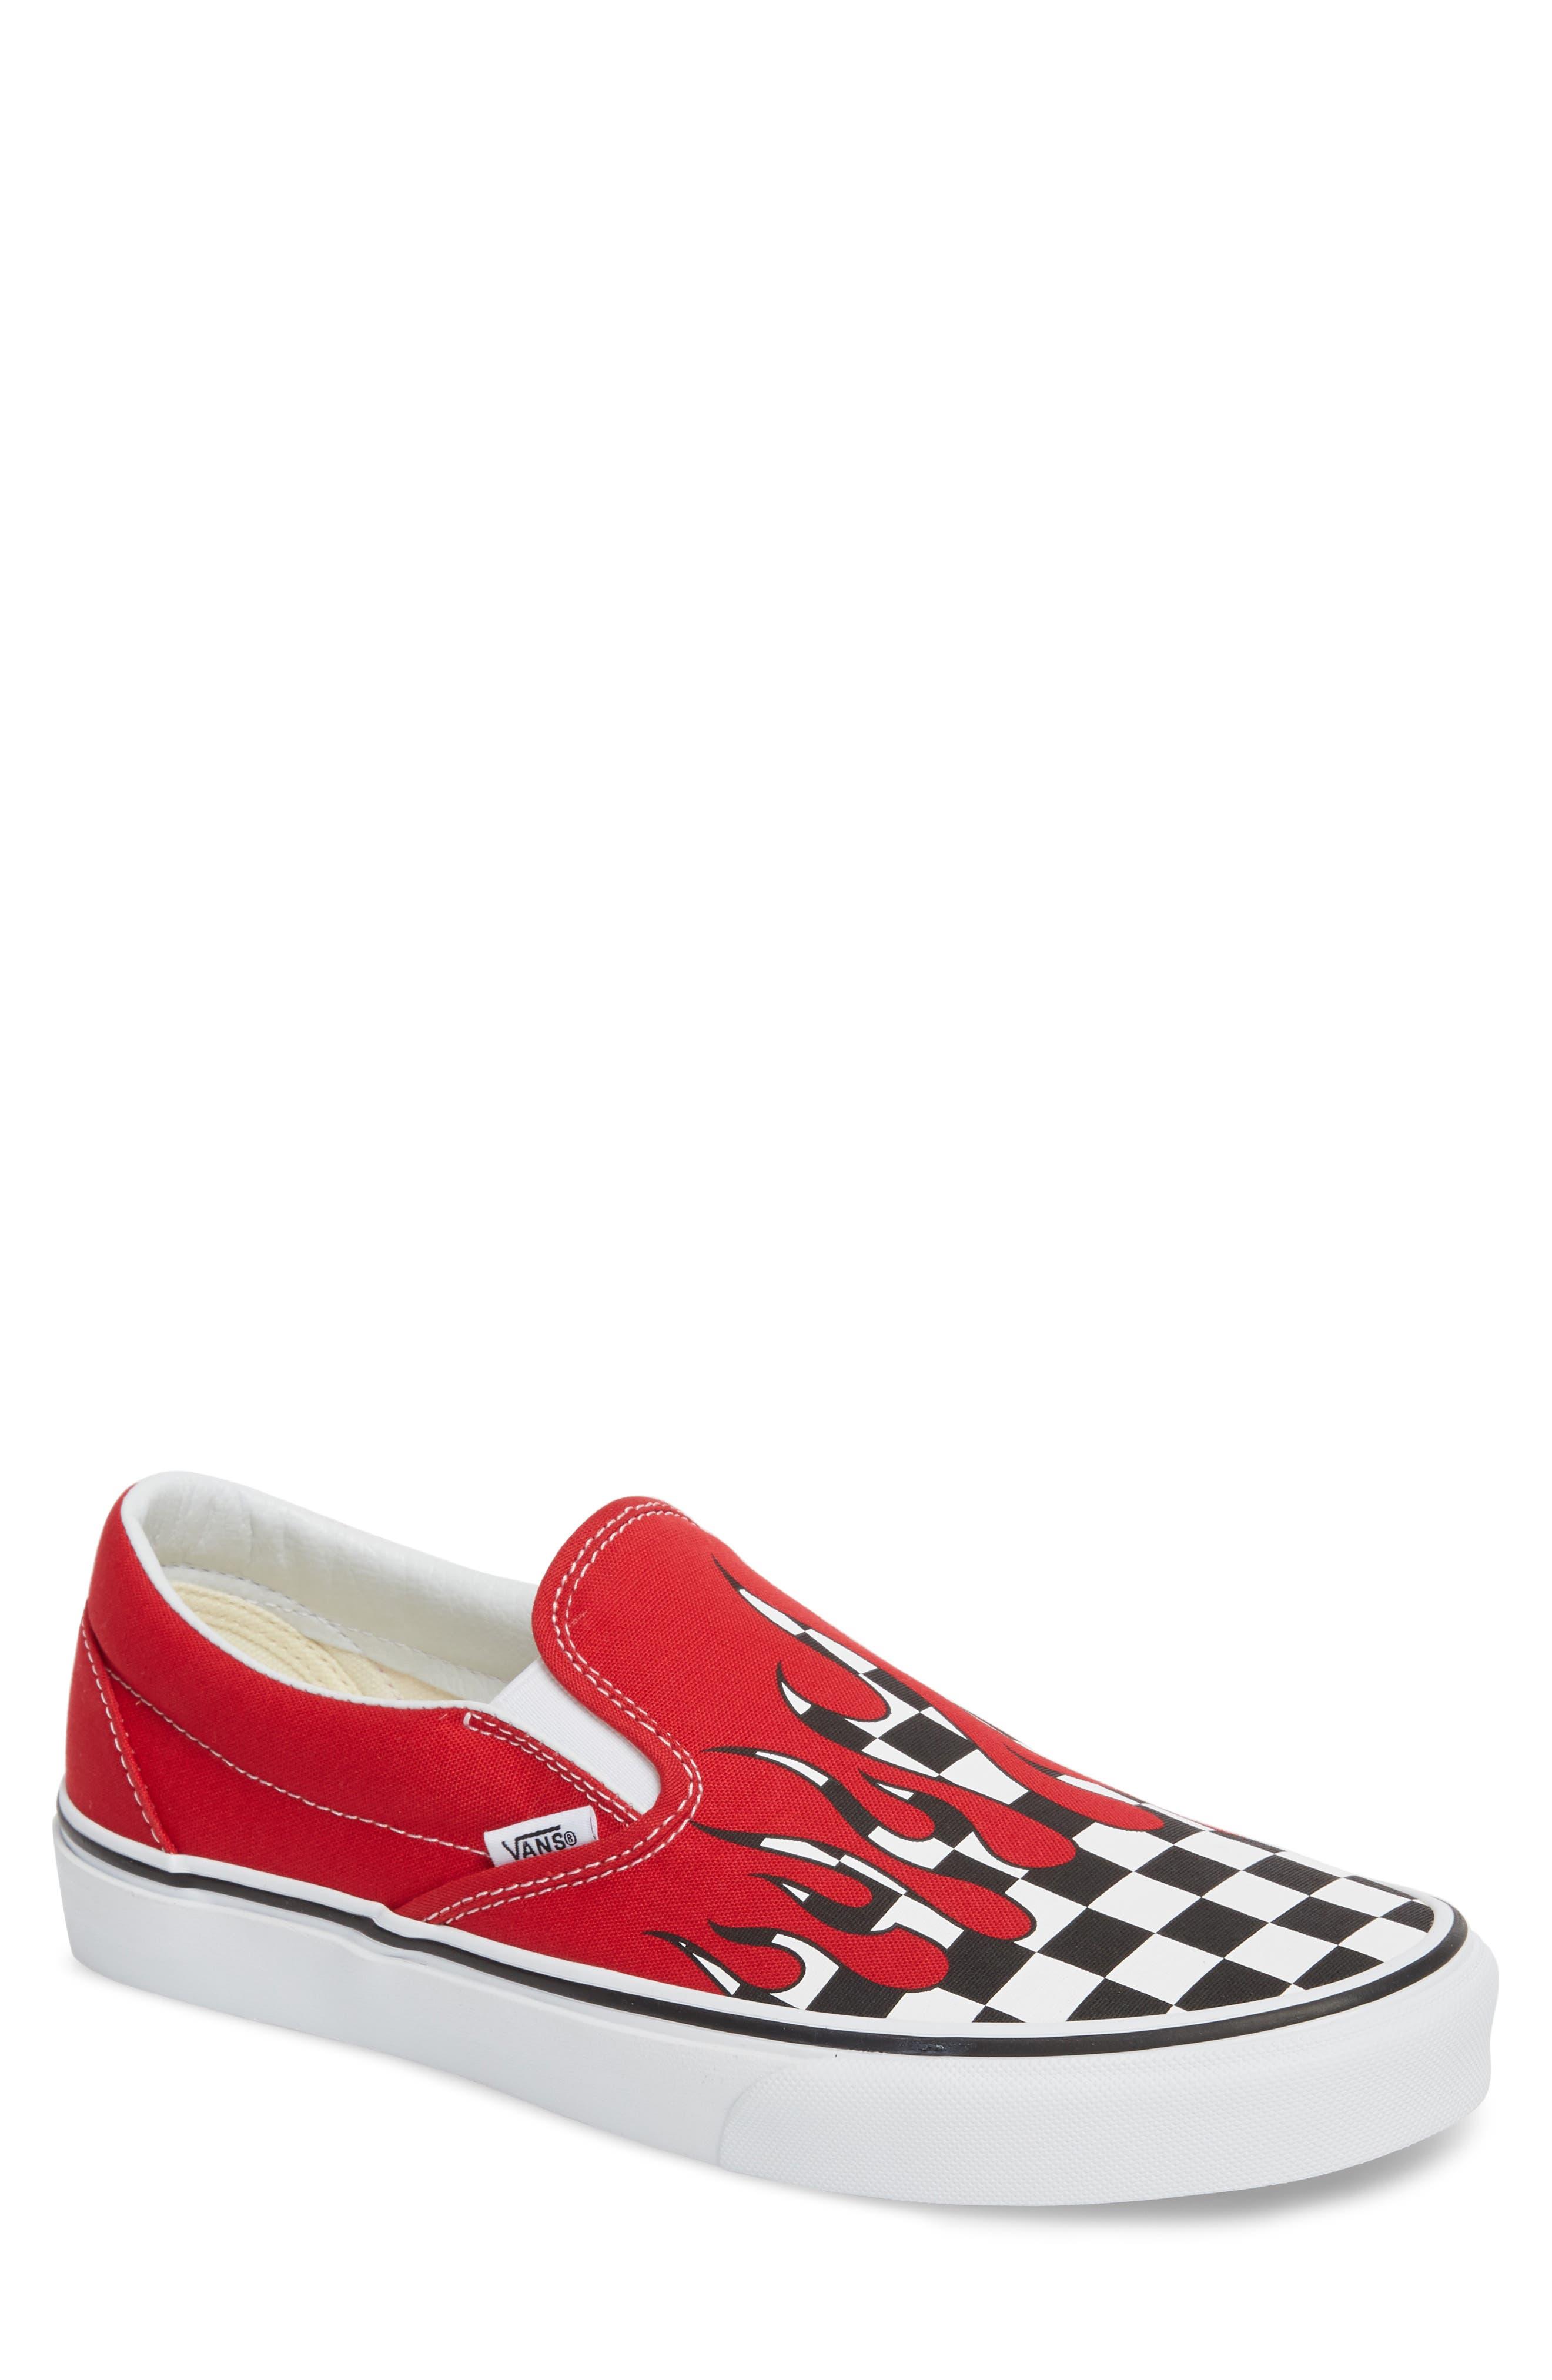 UA Classic Slip-On Sneaker,                             Main thumbnail 1, color,                             Racing Red/ White Checker